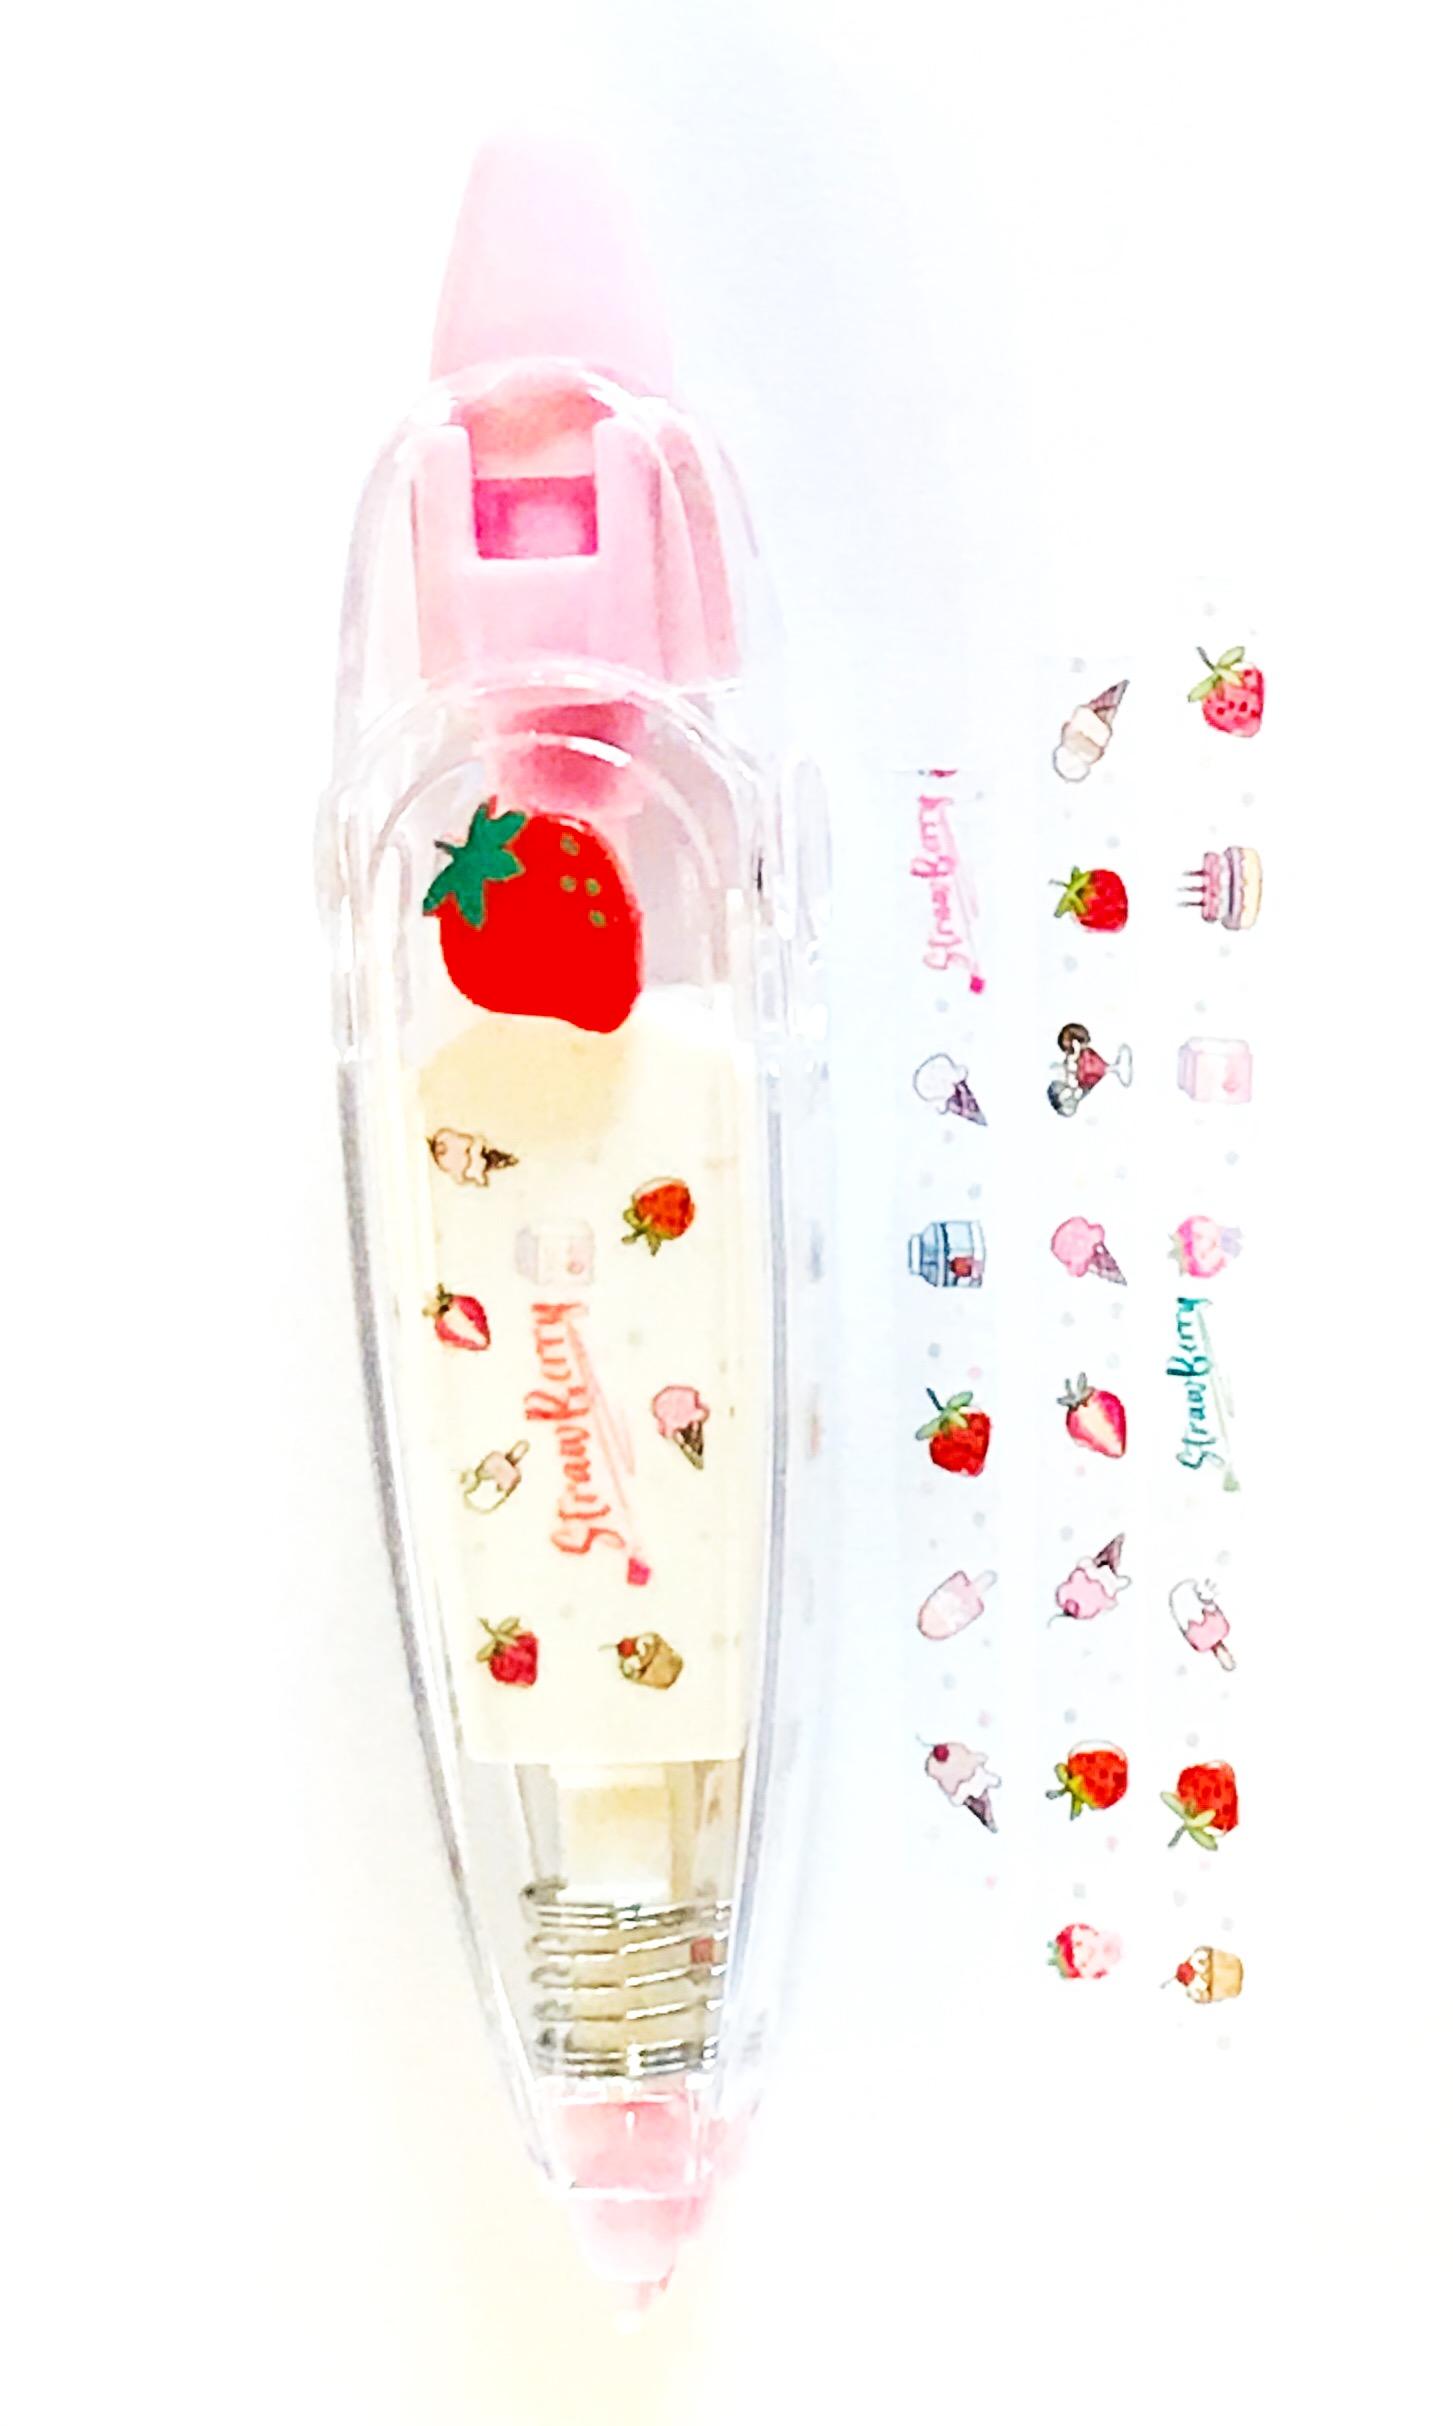 dekor roller eper